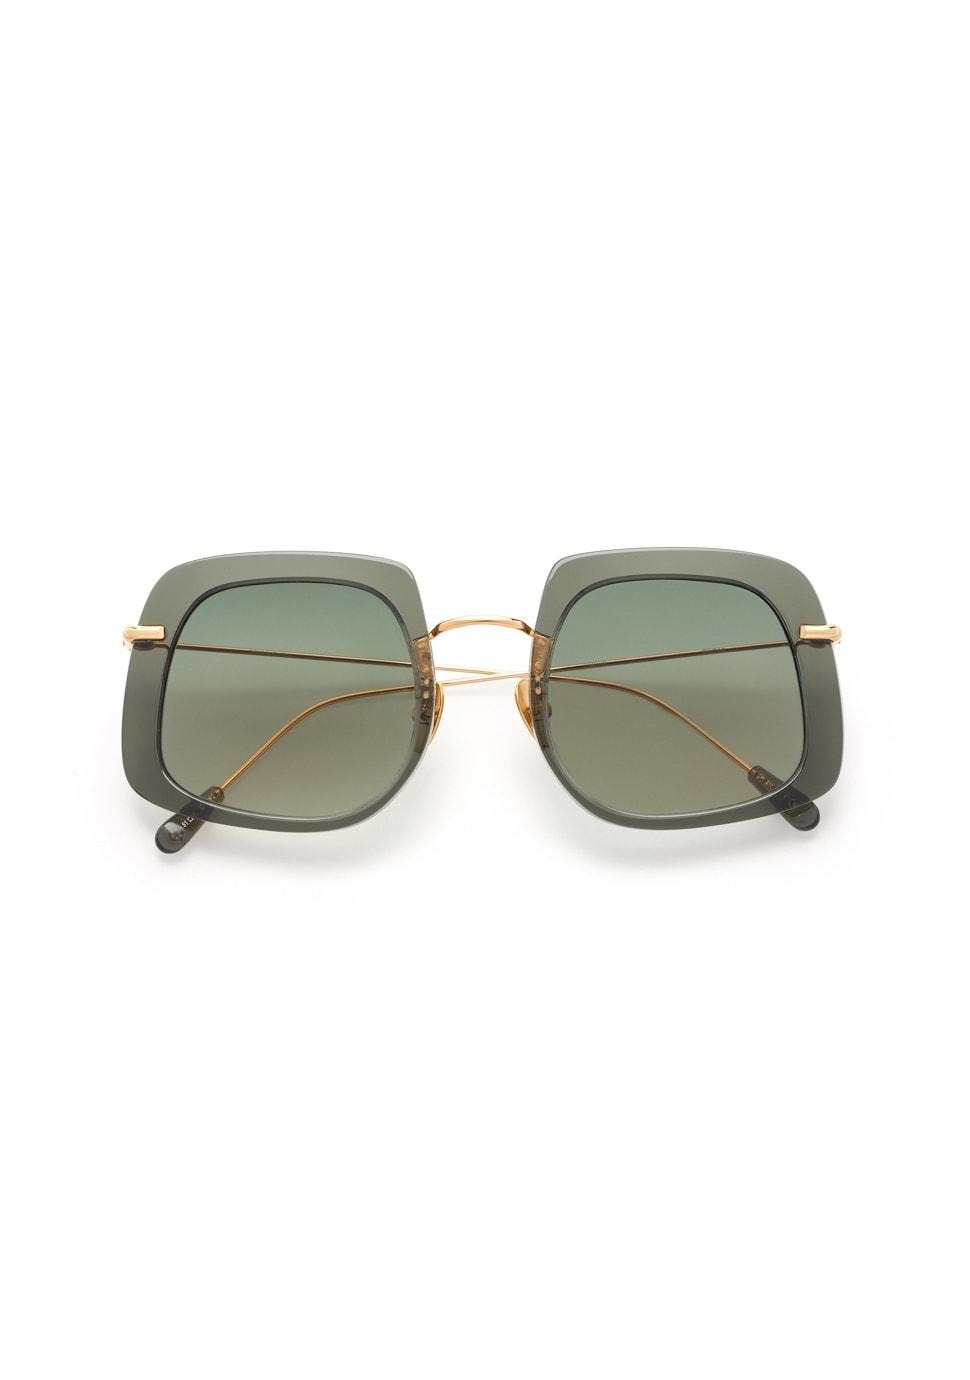 ed76f5e2bd Gafas de sol de mujer